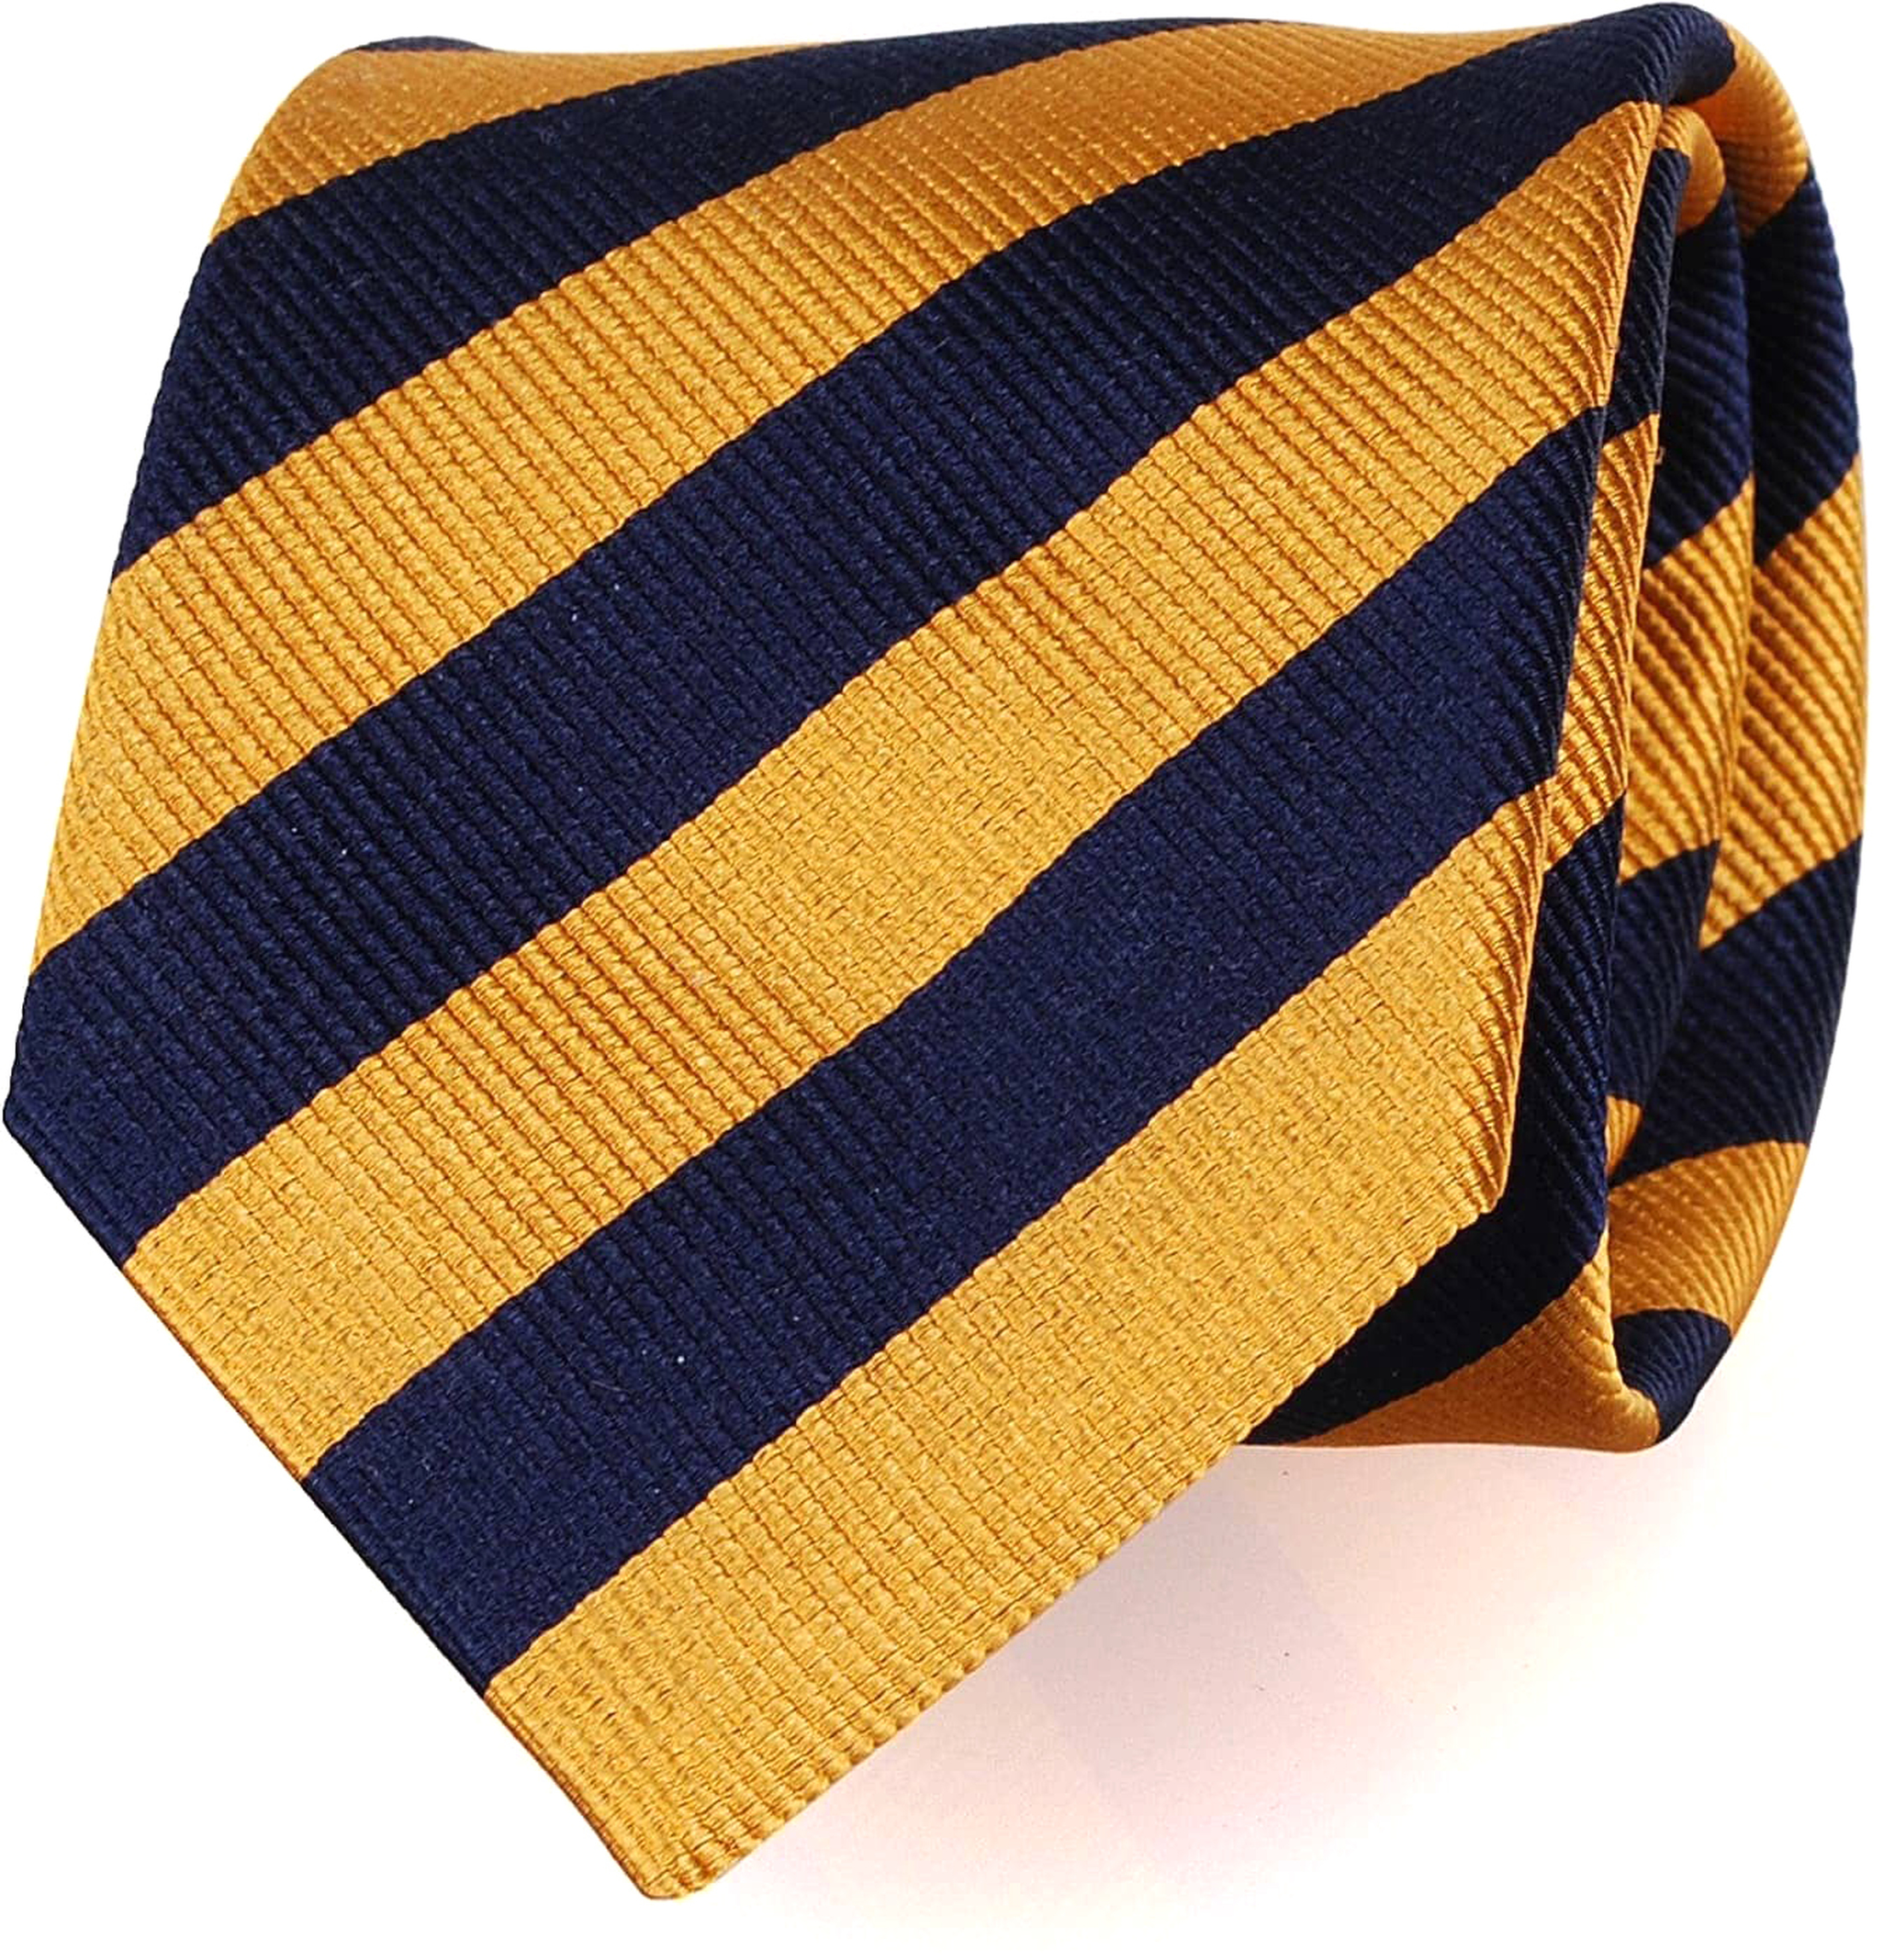 Silk Tie Lime Gold + Navy Striped FD17 foto 0